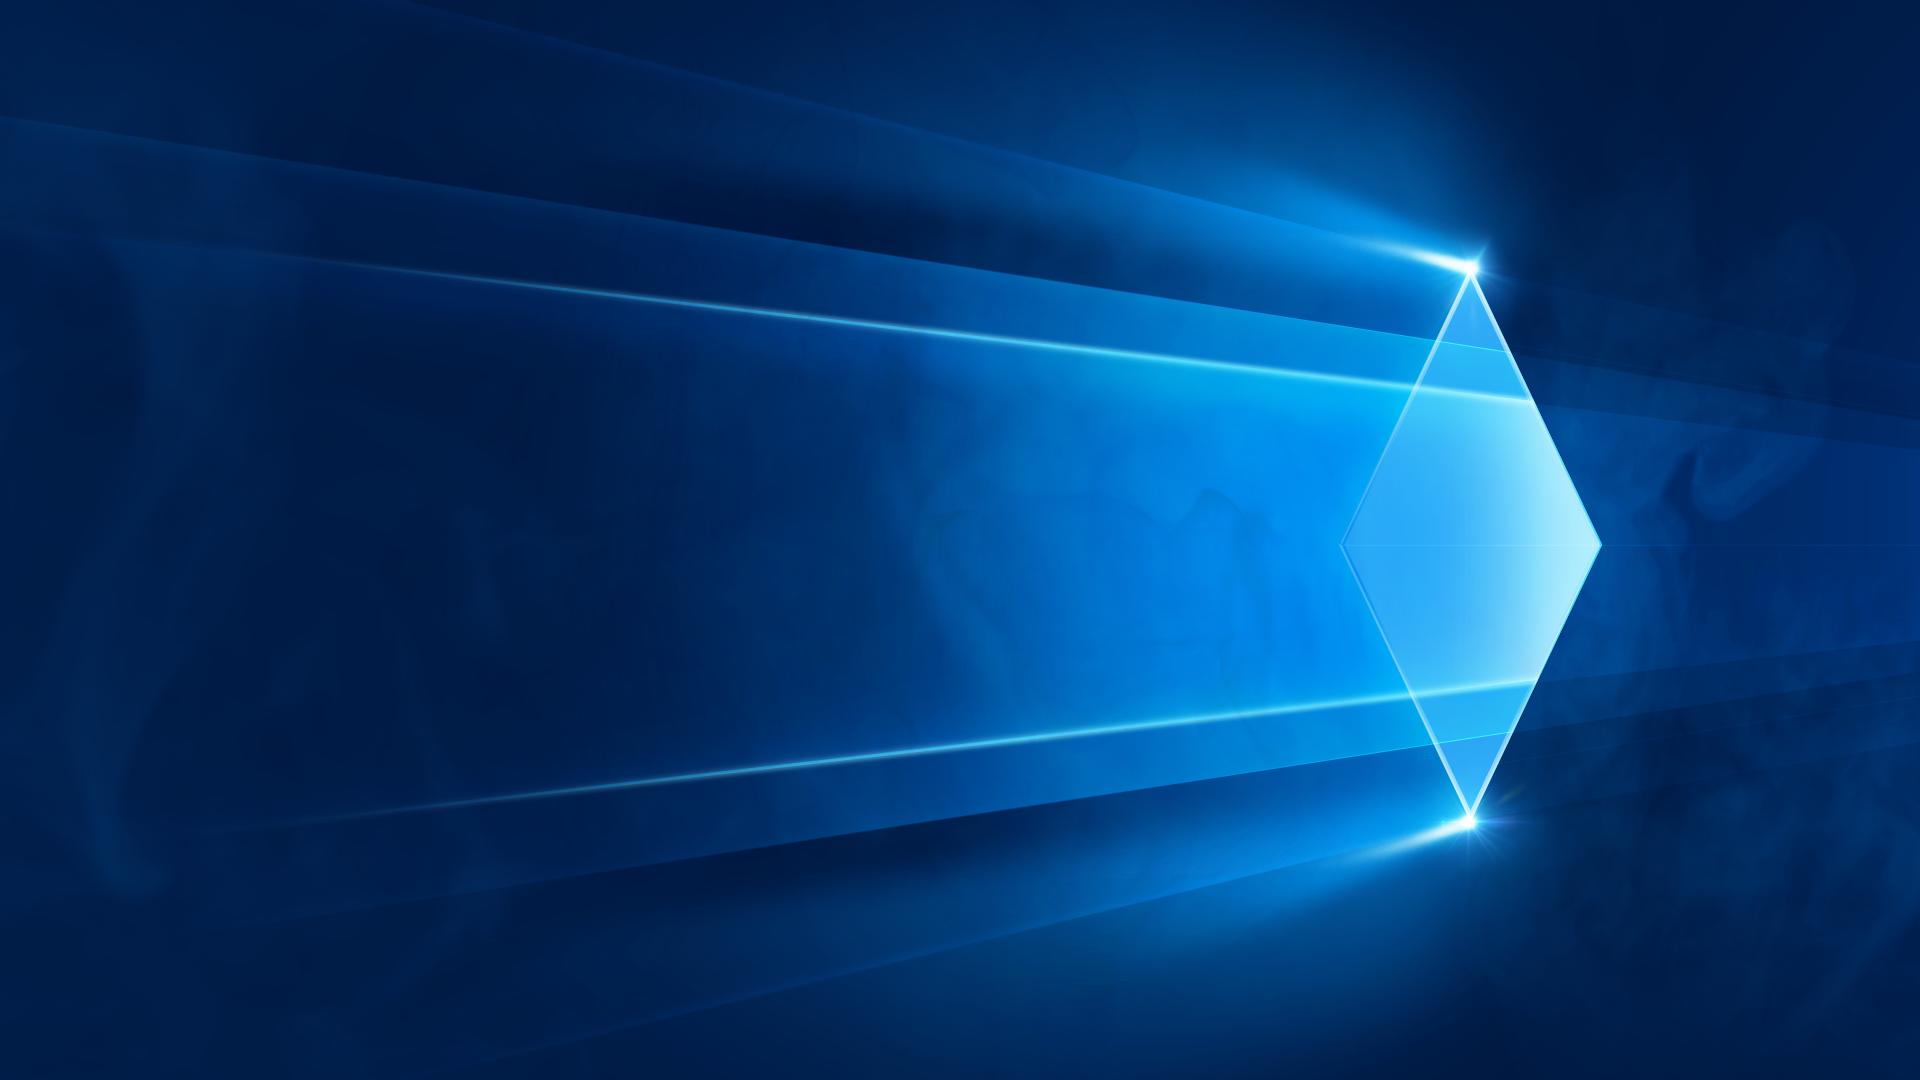 Wallpaper Sunlight Blue Lens Flare Windows 10 Laser